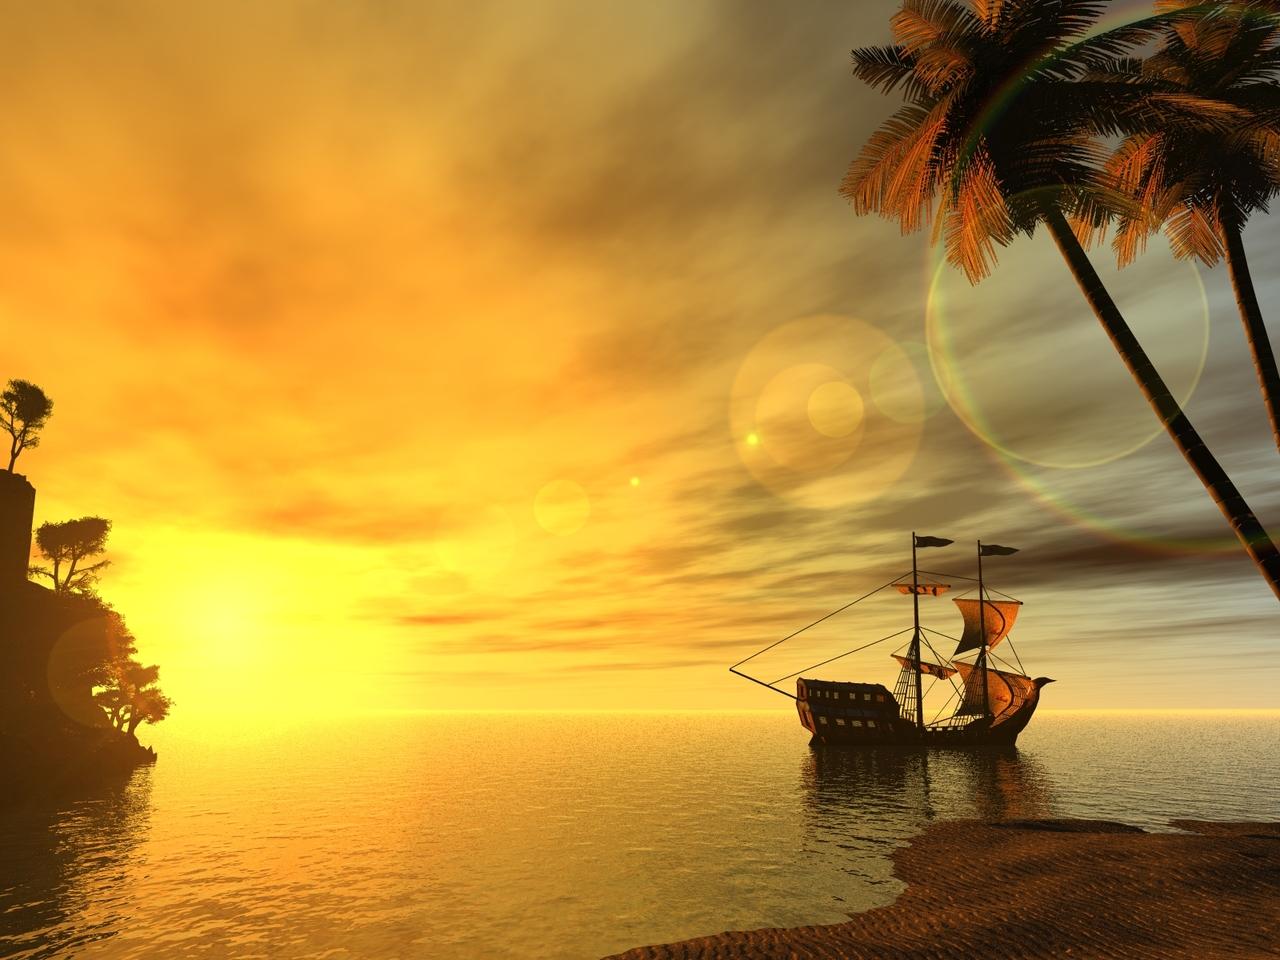 Dream_island_large